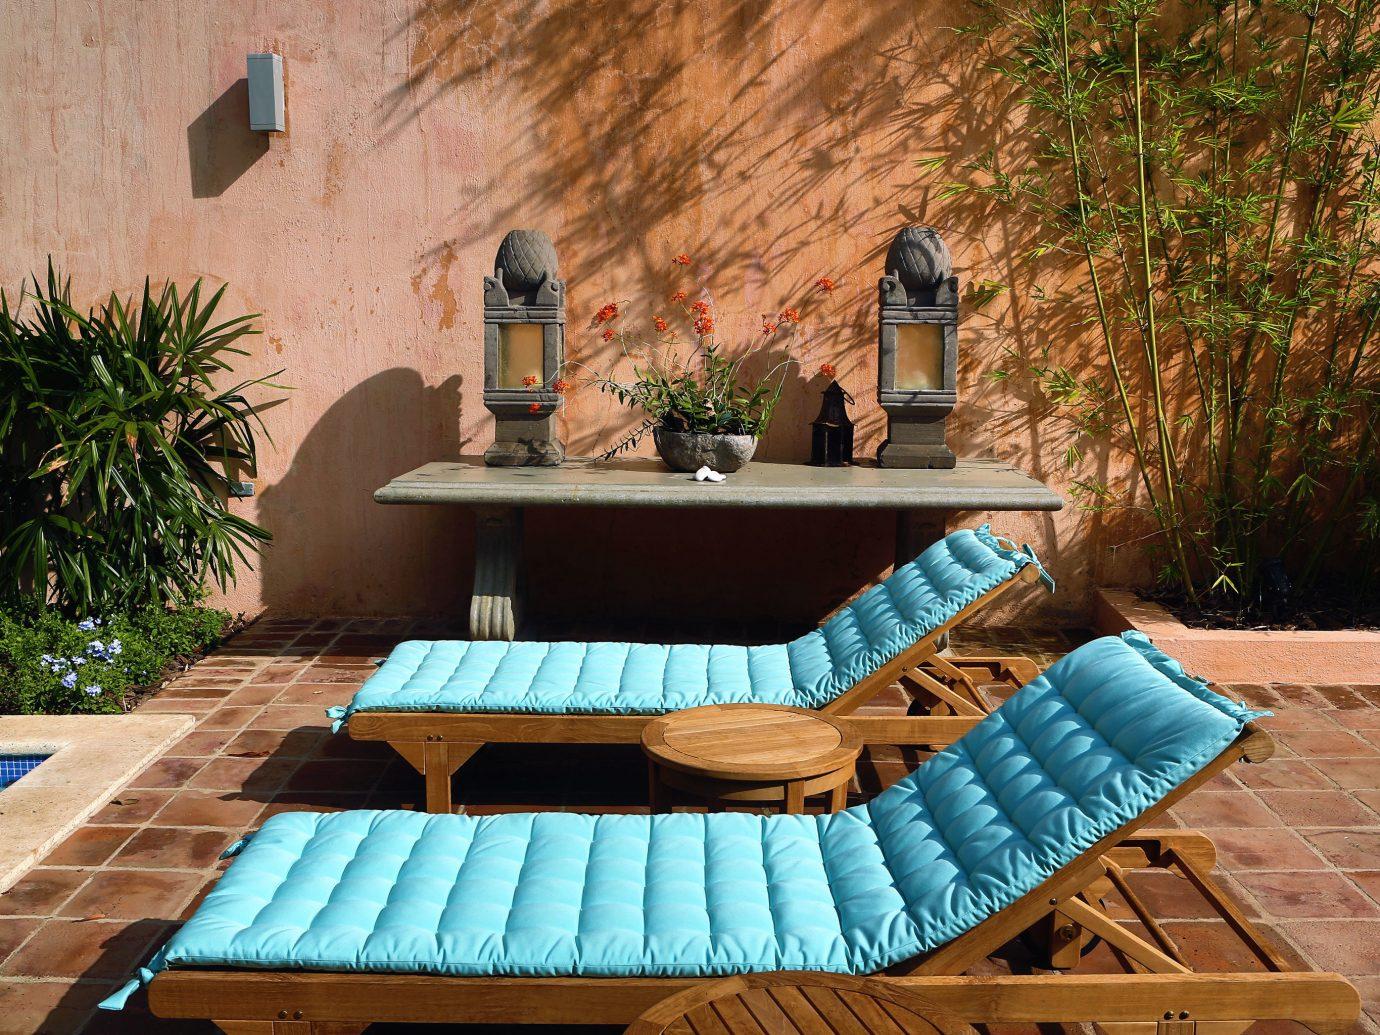 Lounge Chairs At Casas Del XVI - Dominican Republic Luxury Resort